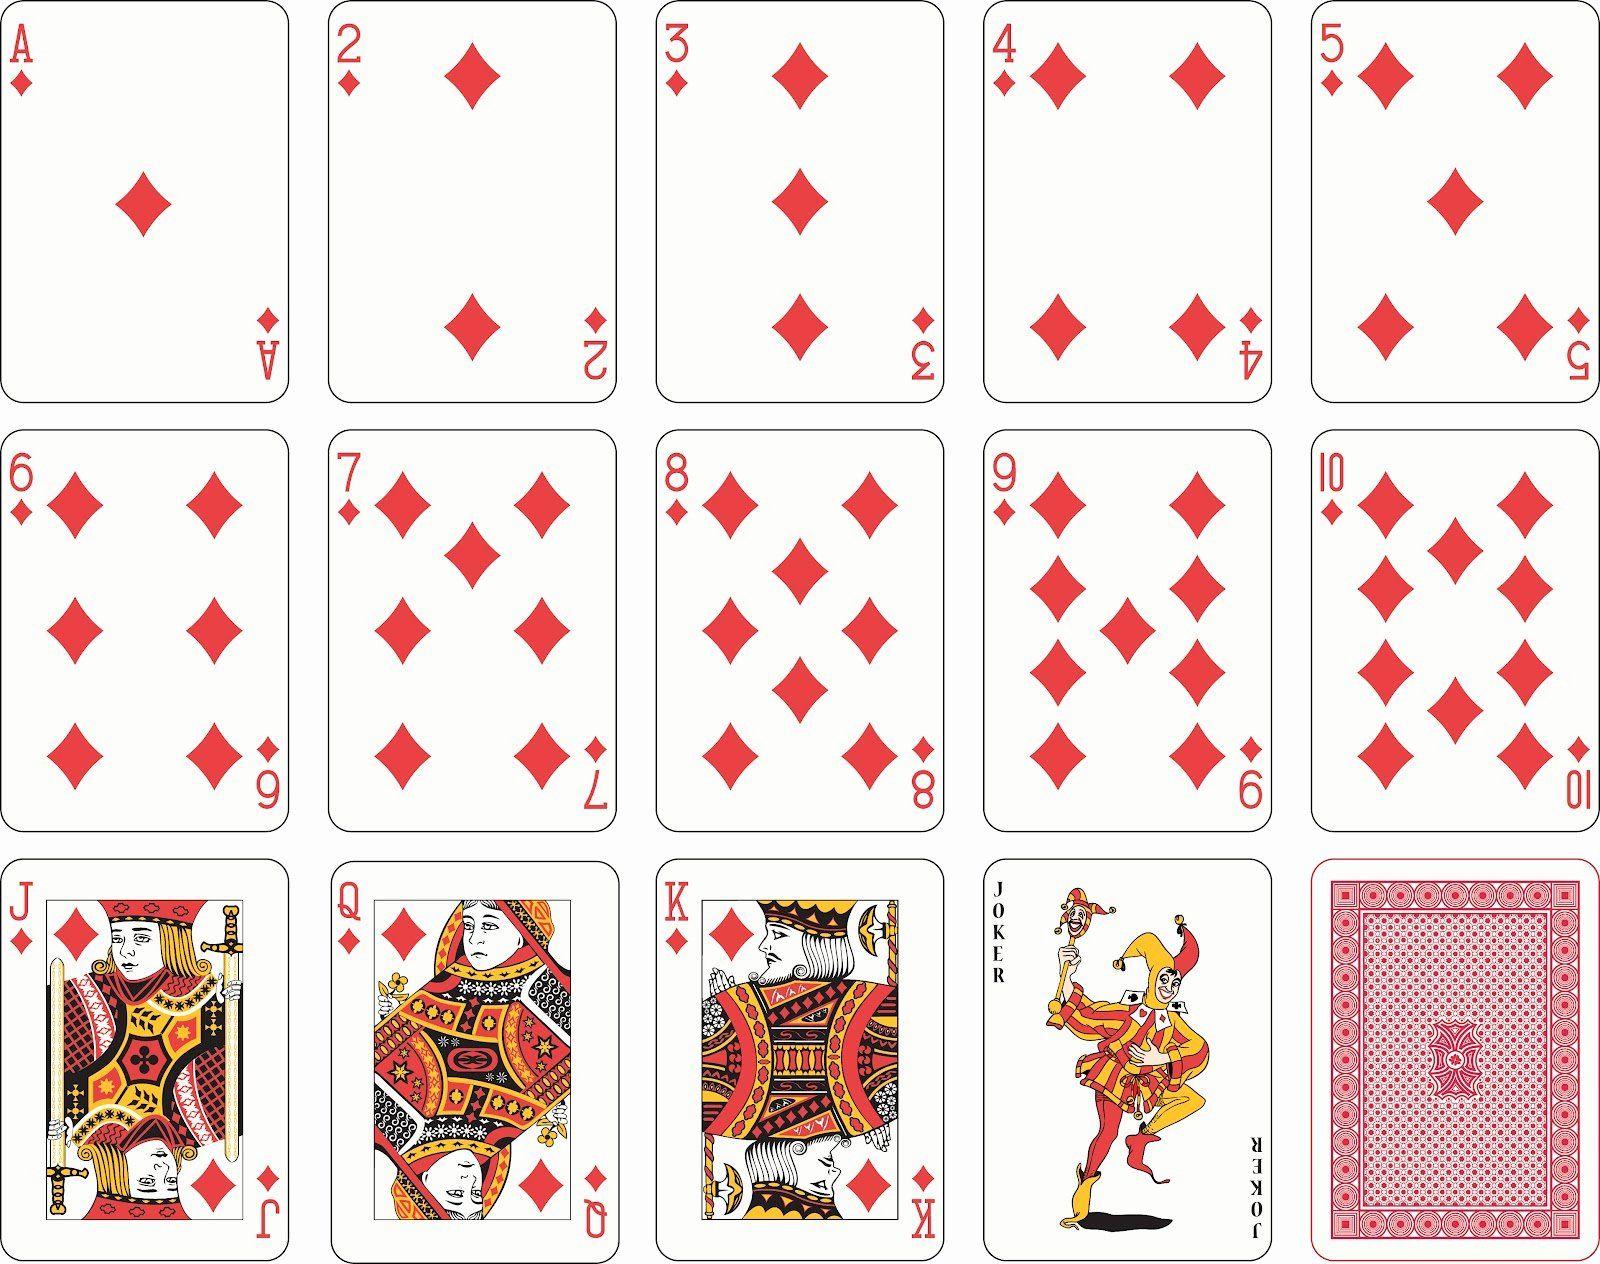 Deck Of Cards Template Unique Stock Vector Full Deck Playing Cards Templates E Temas Naipes Cartas De Baralho Baralho